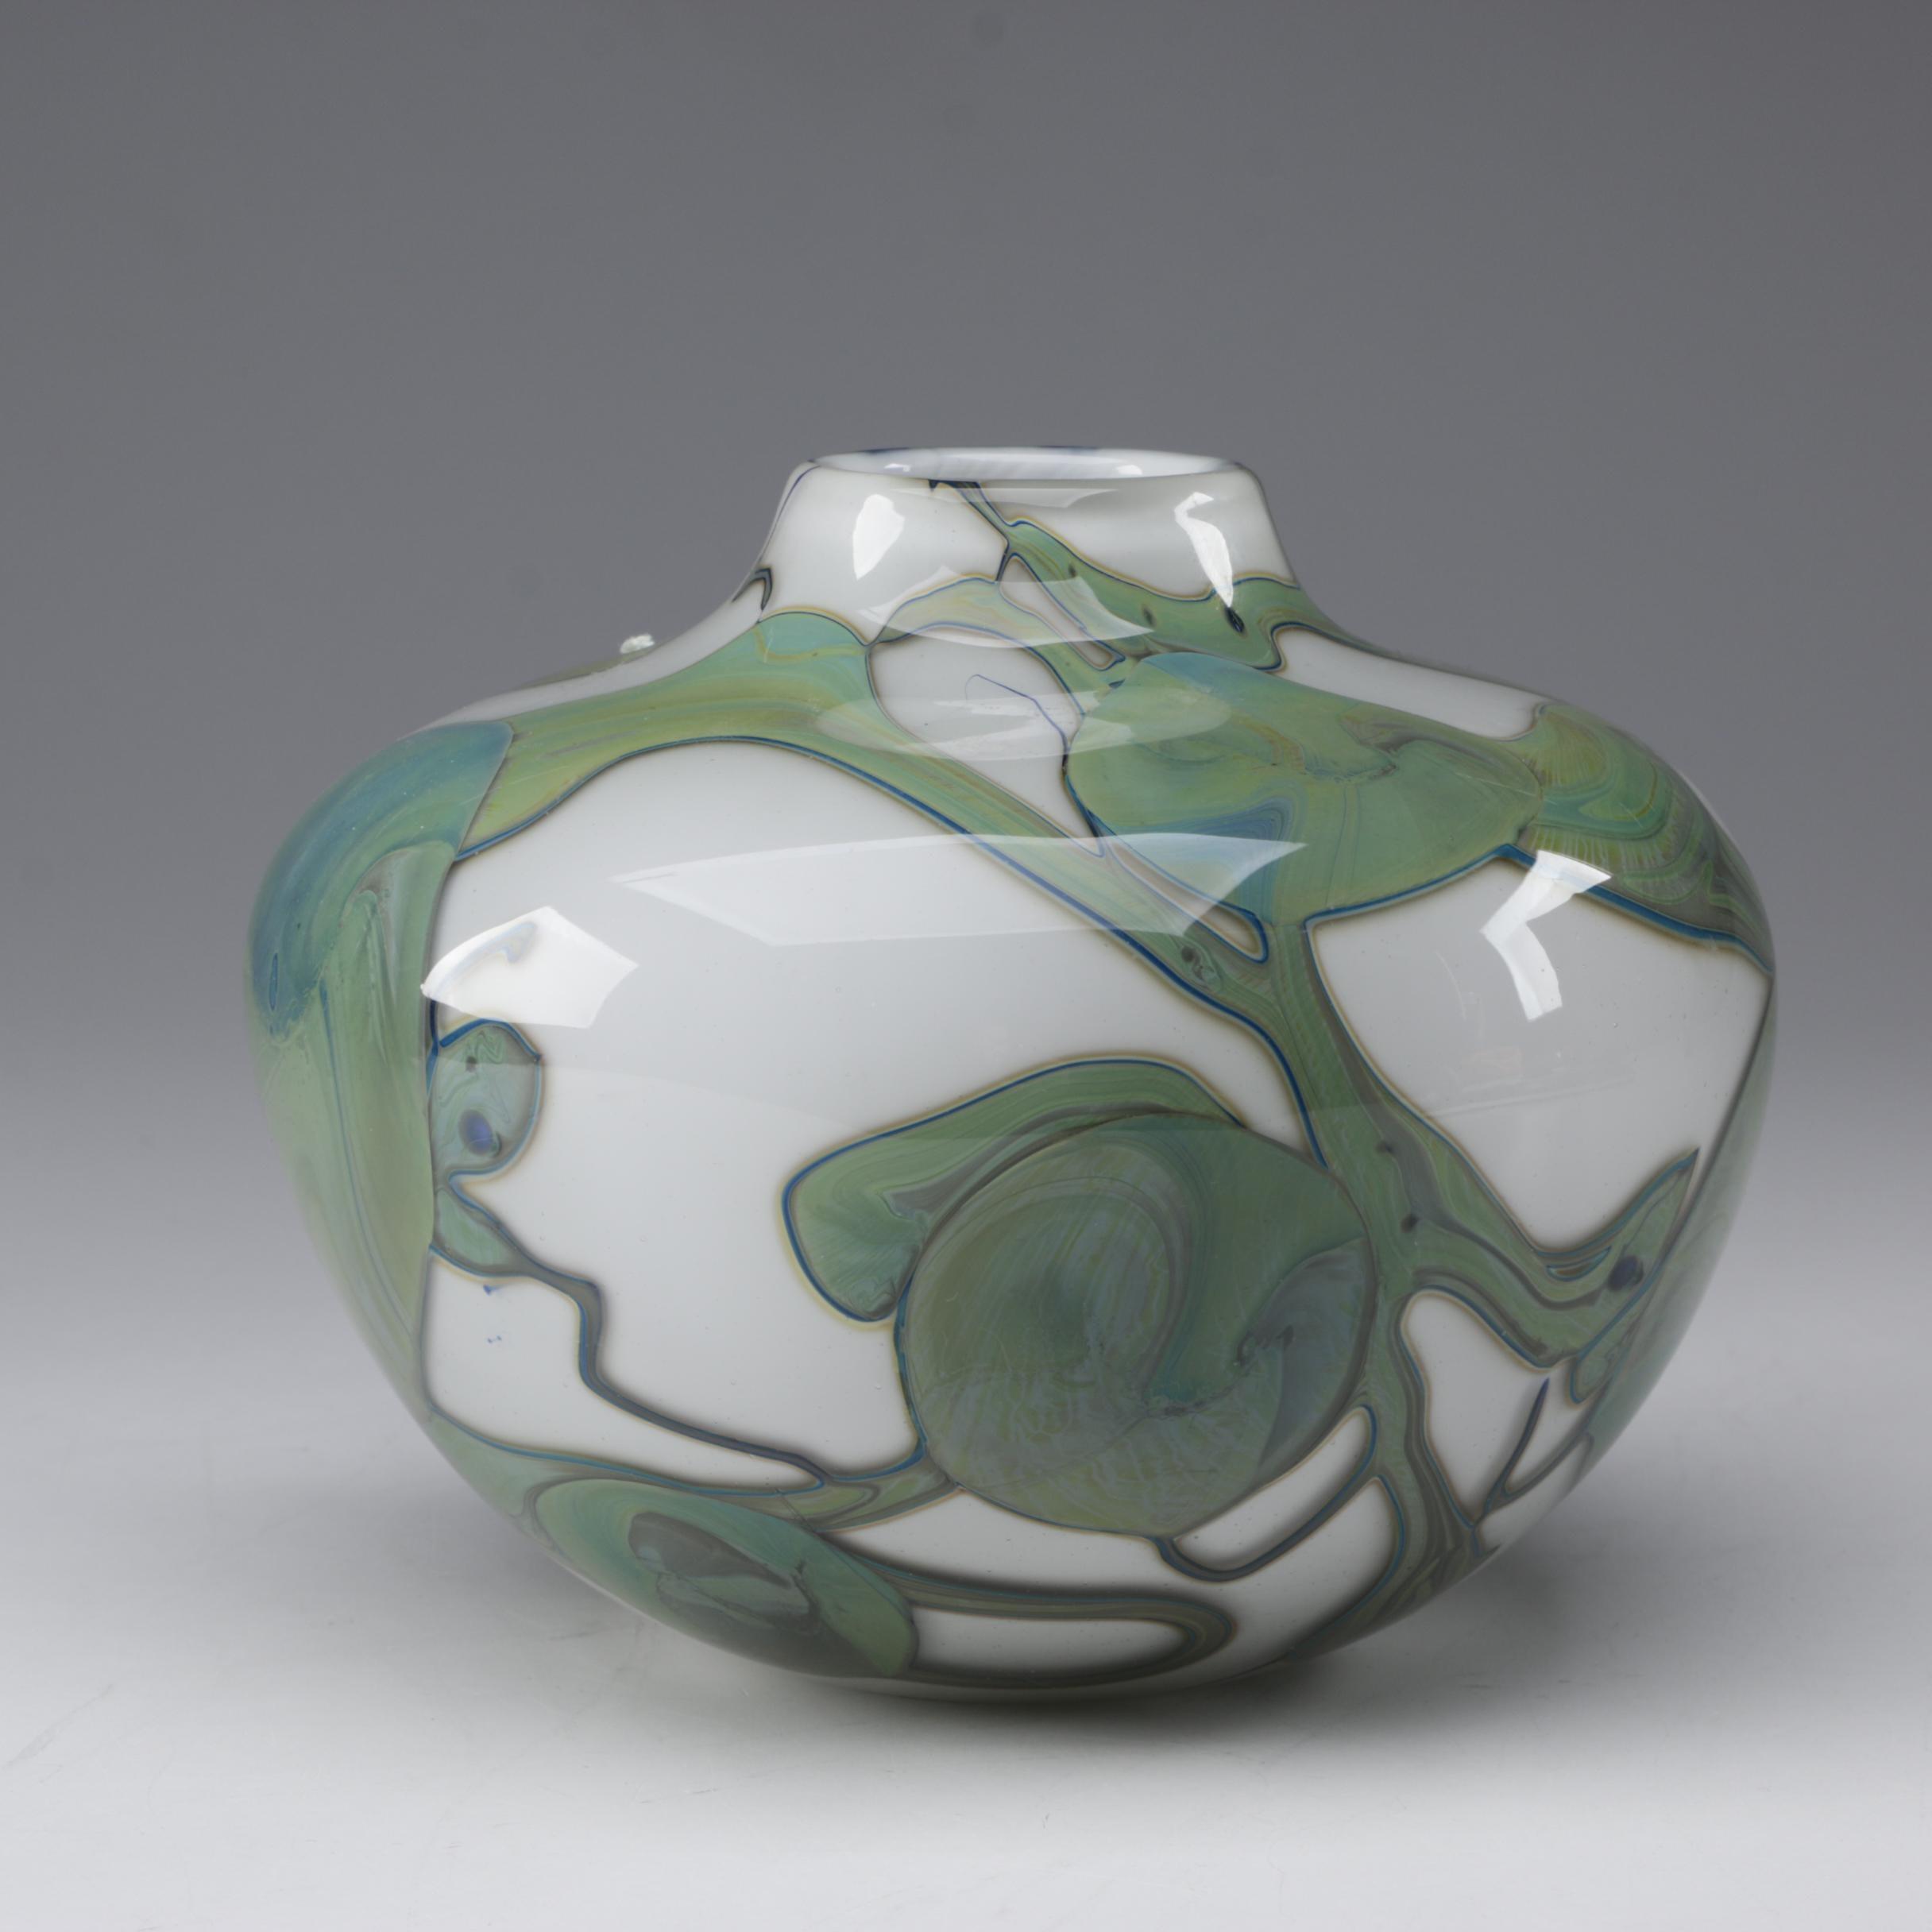 John Byron Art Glass Vase, 1978